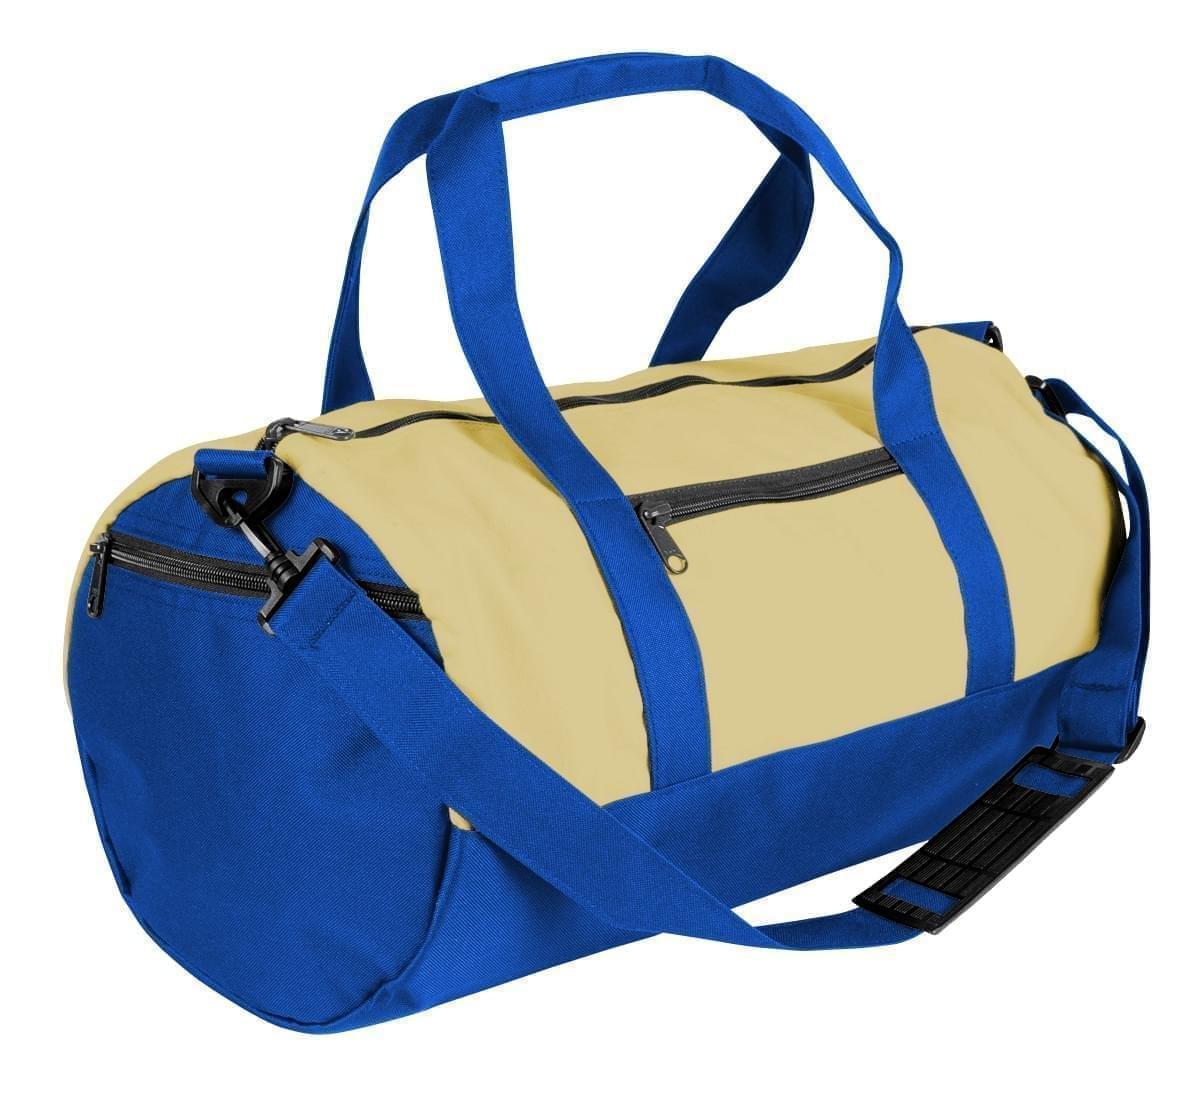 USA Made Heavy Canvas Athletic Barrel Bags, Natural-Royal Blue, PMLXZ2AAV3